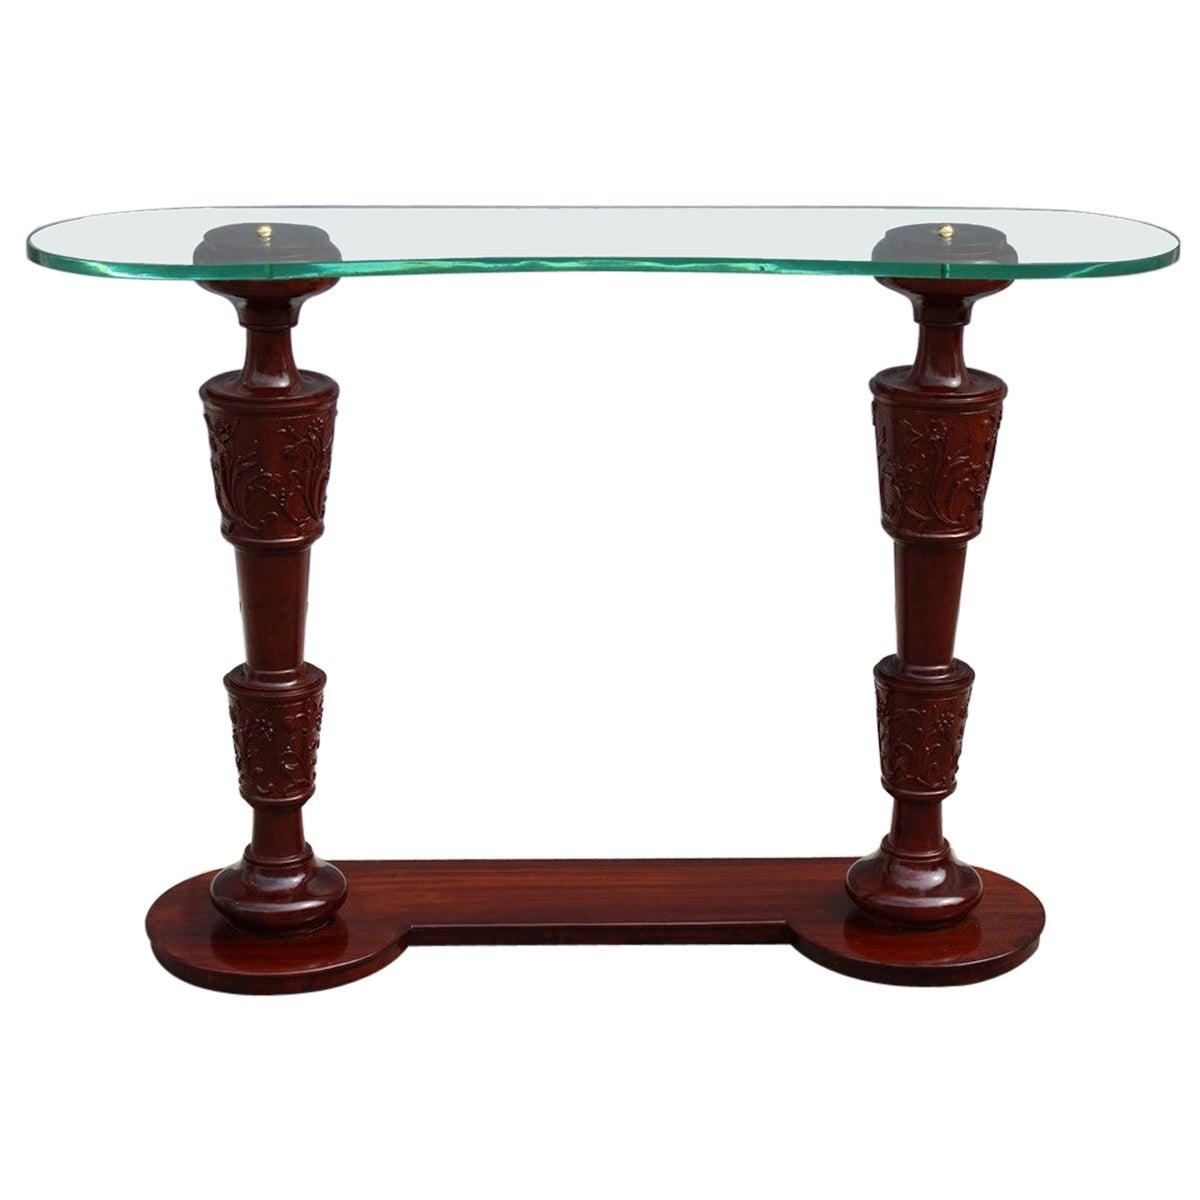 Console Pier Luigi Colli Midcentury Italian Design Mahogany Top Glass Often